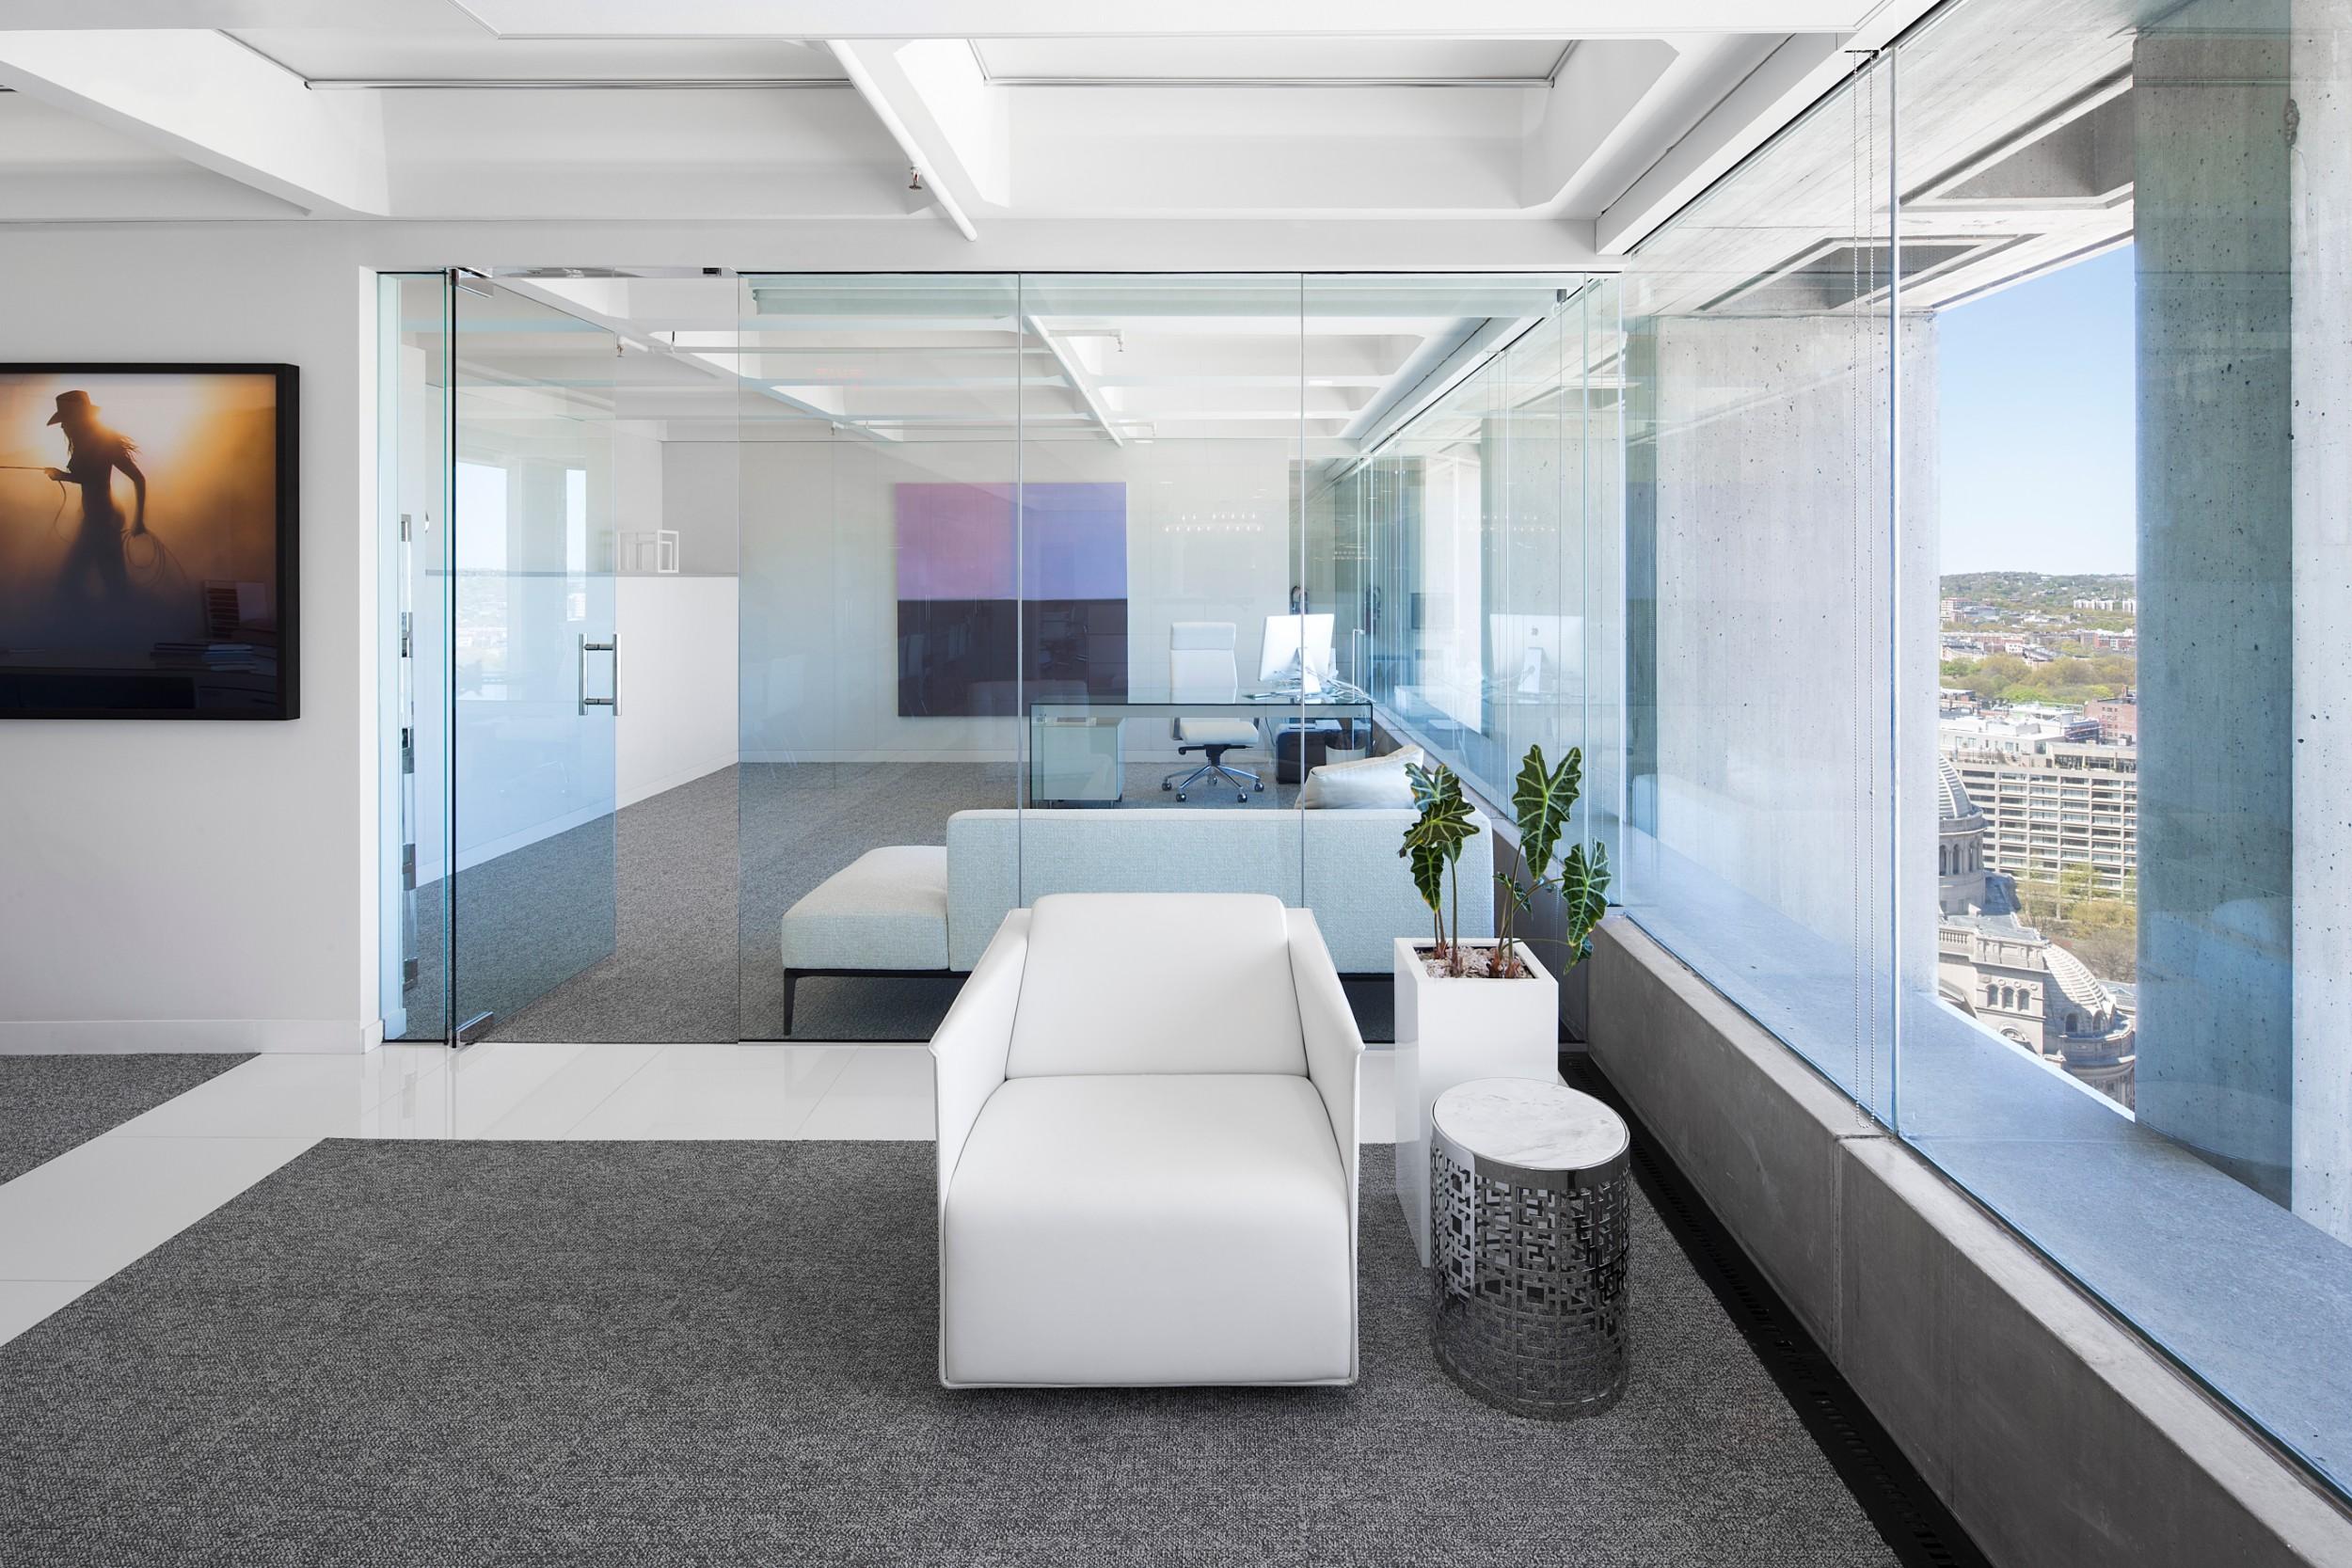 Renegade_Investments_Corderman_Construction_Boston_Seating_Area.jpg